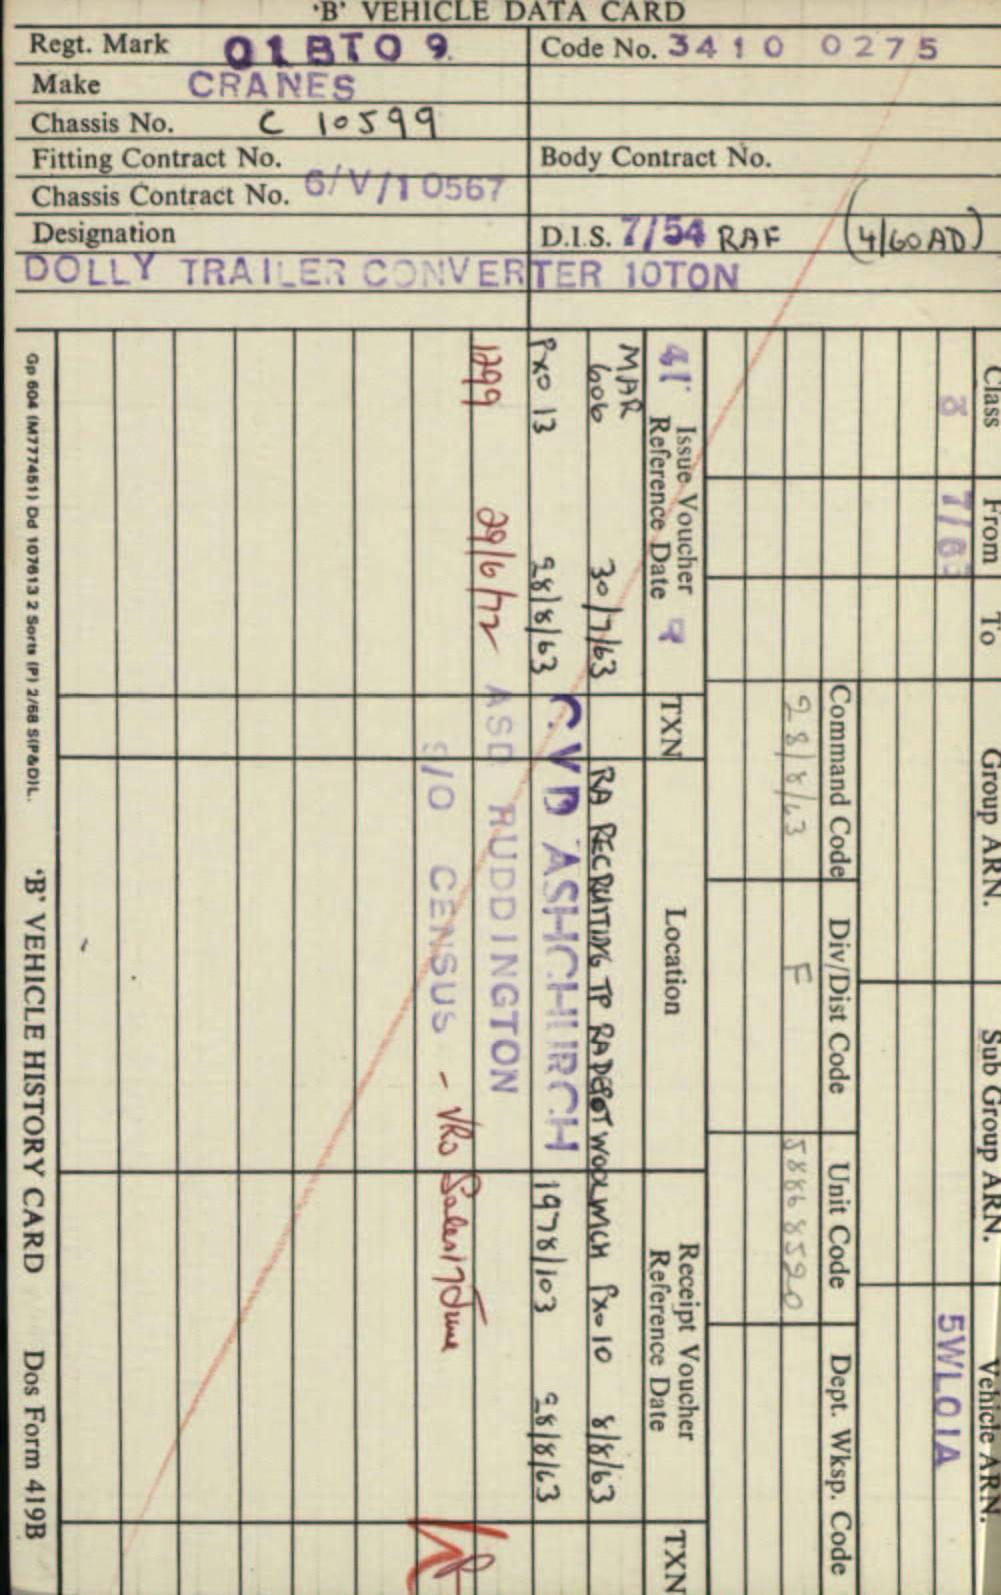 Vehicle records - RLC Digital Archive